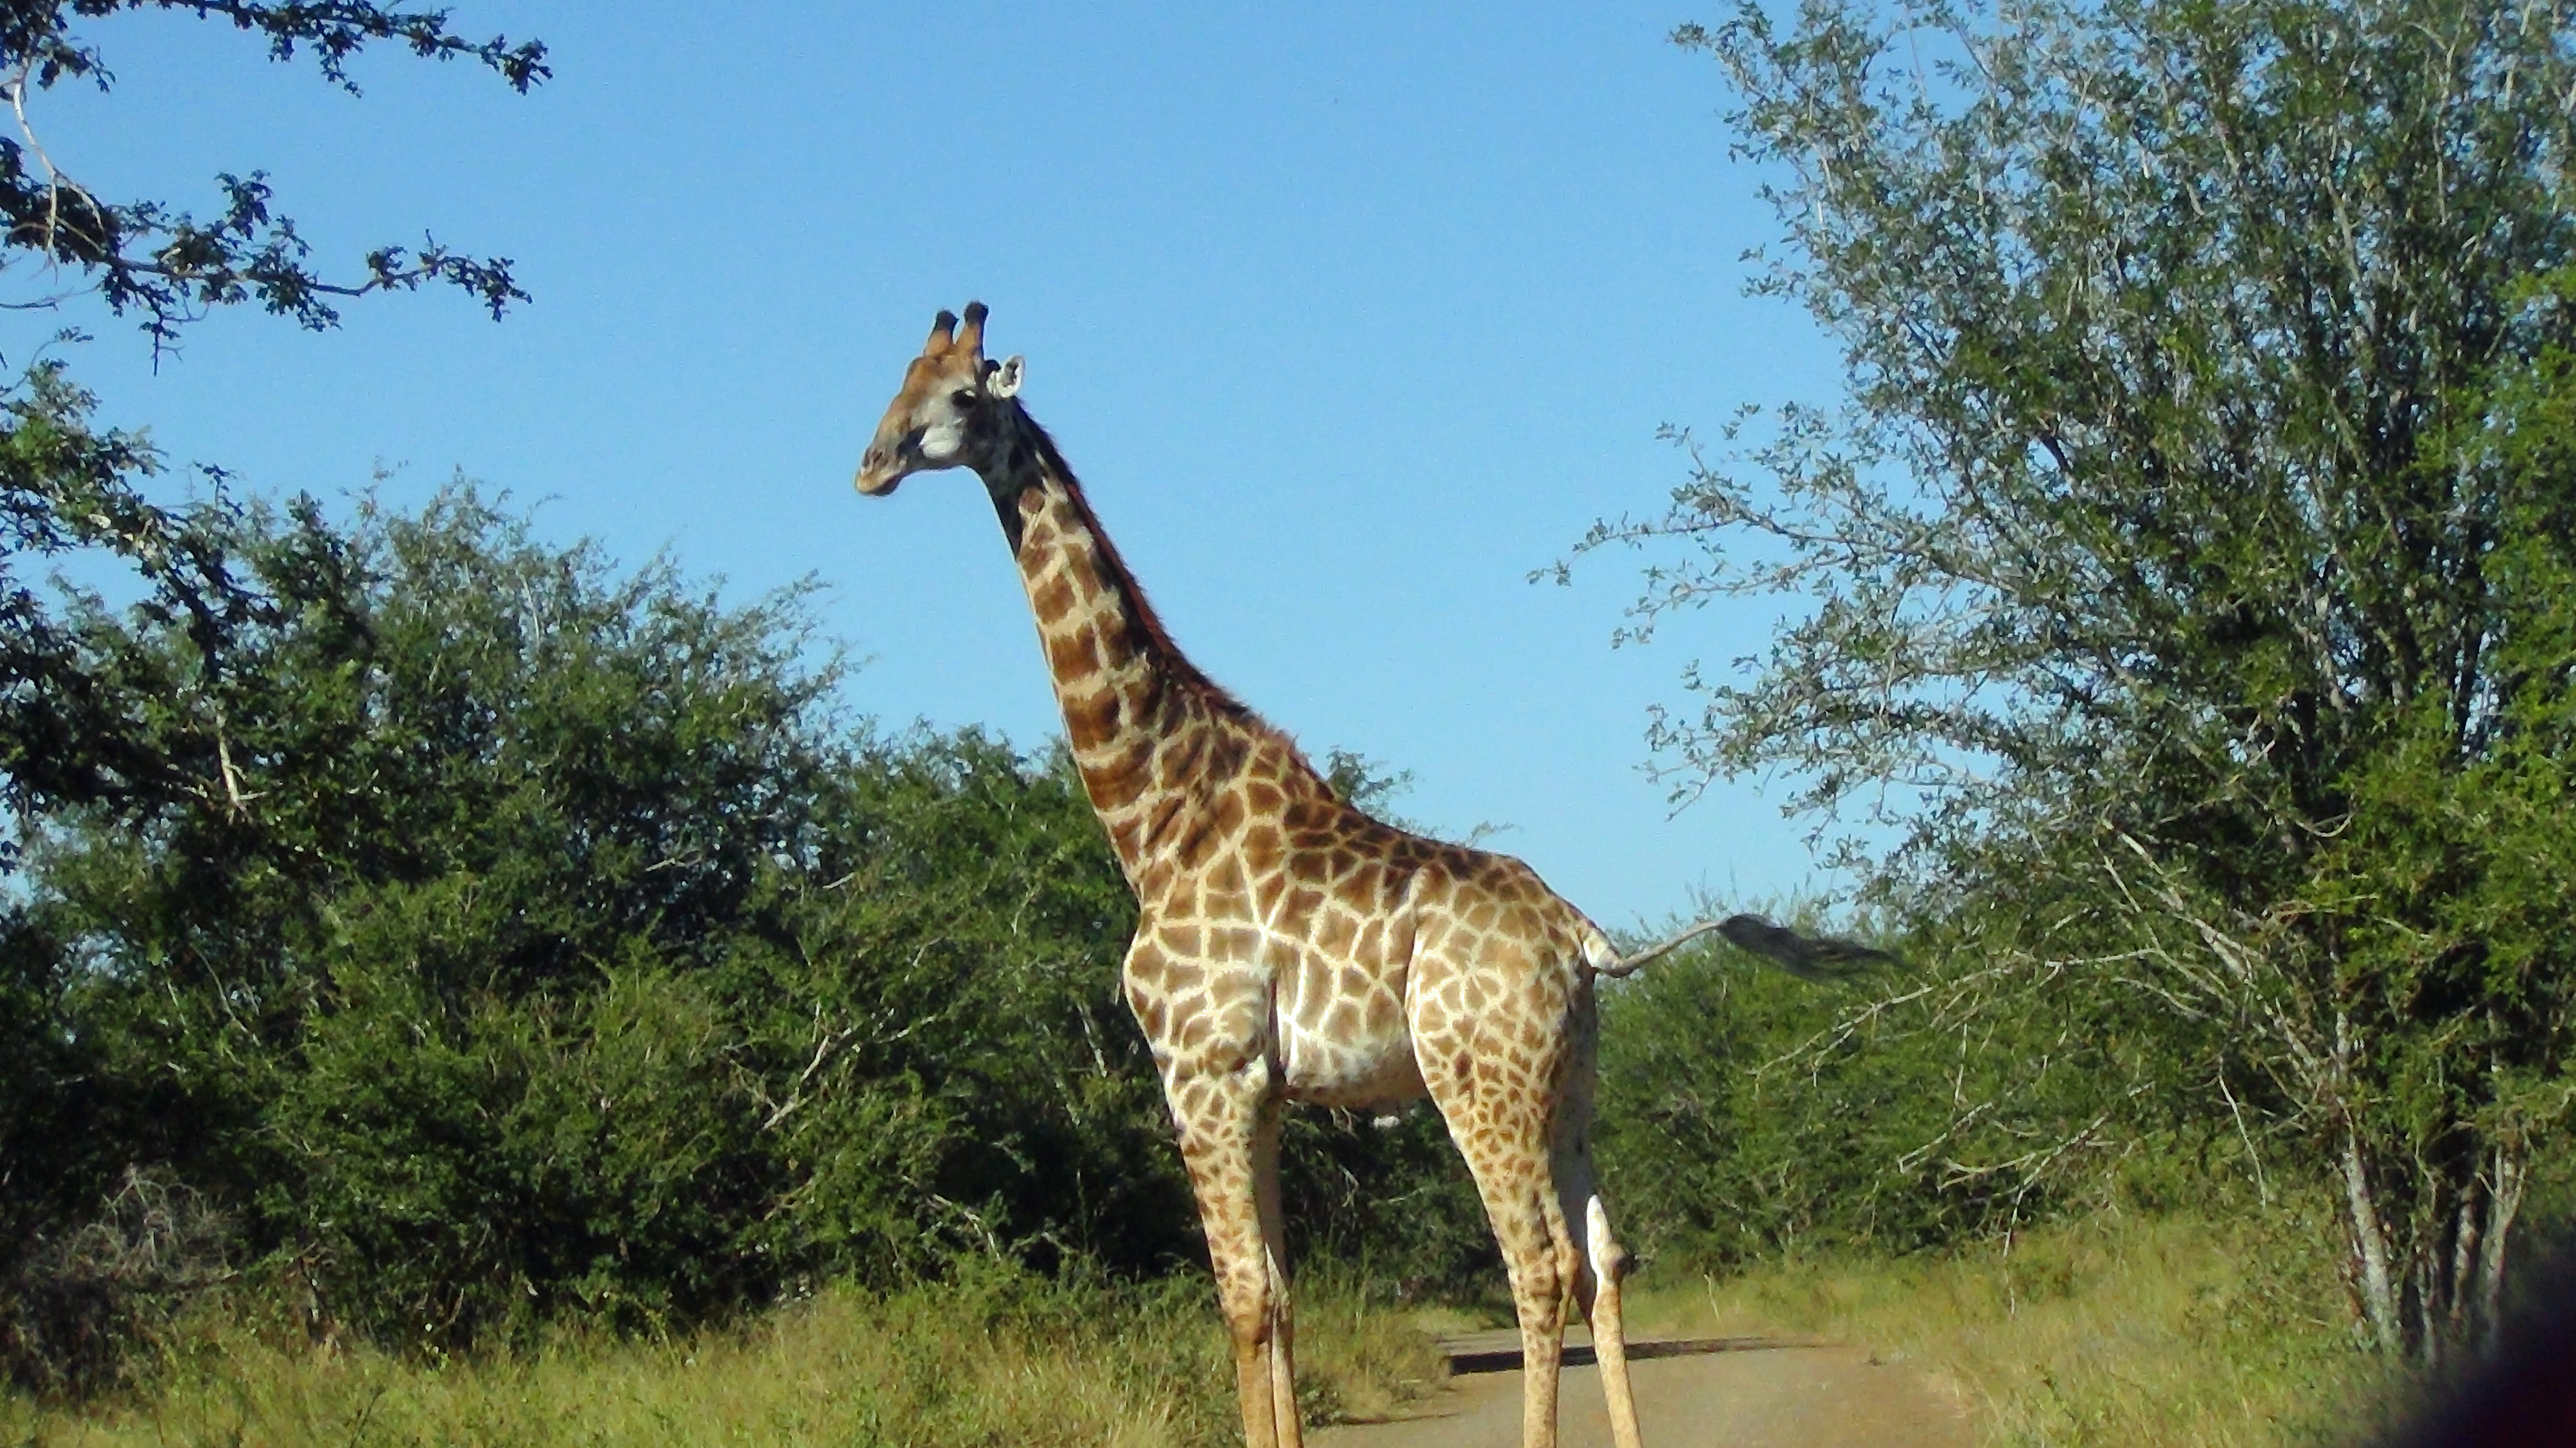 Giraffee in the road